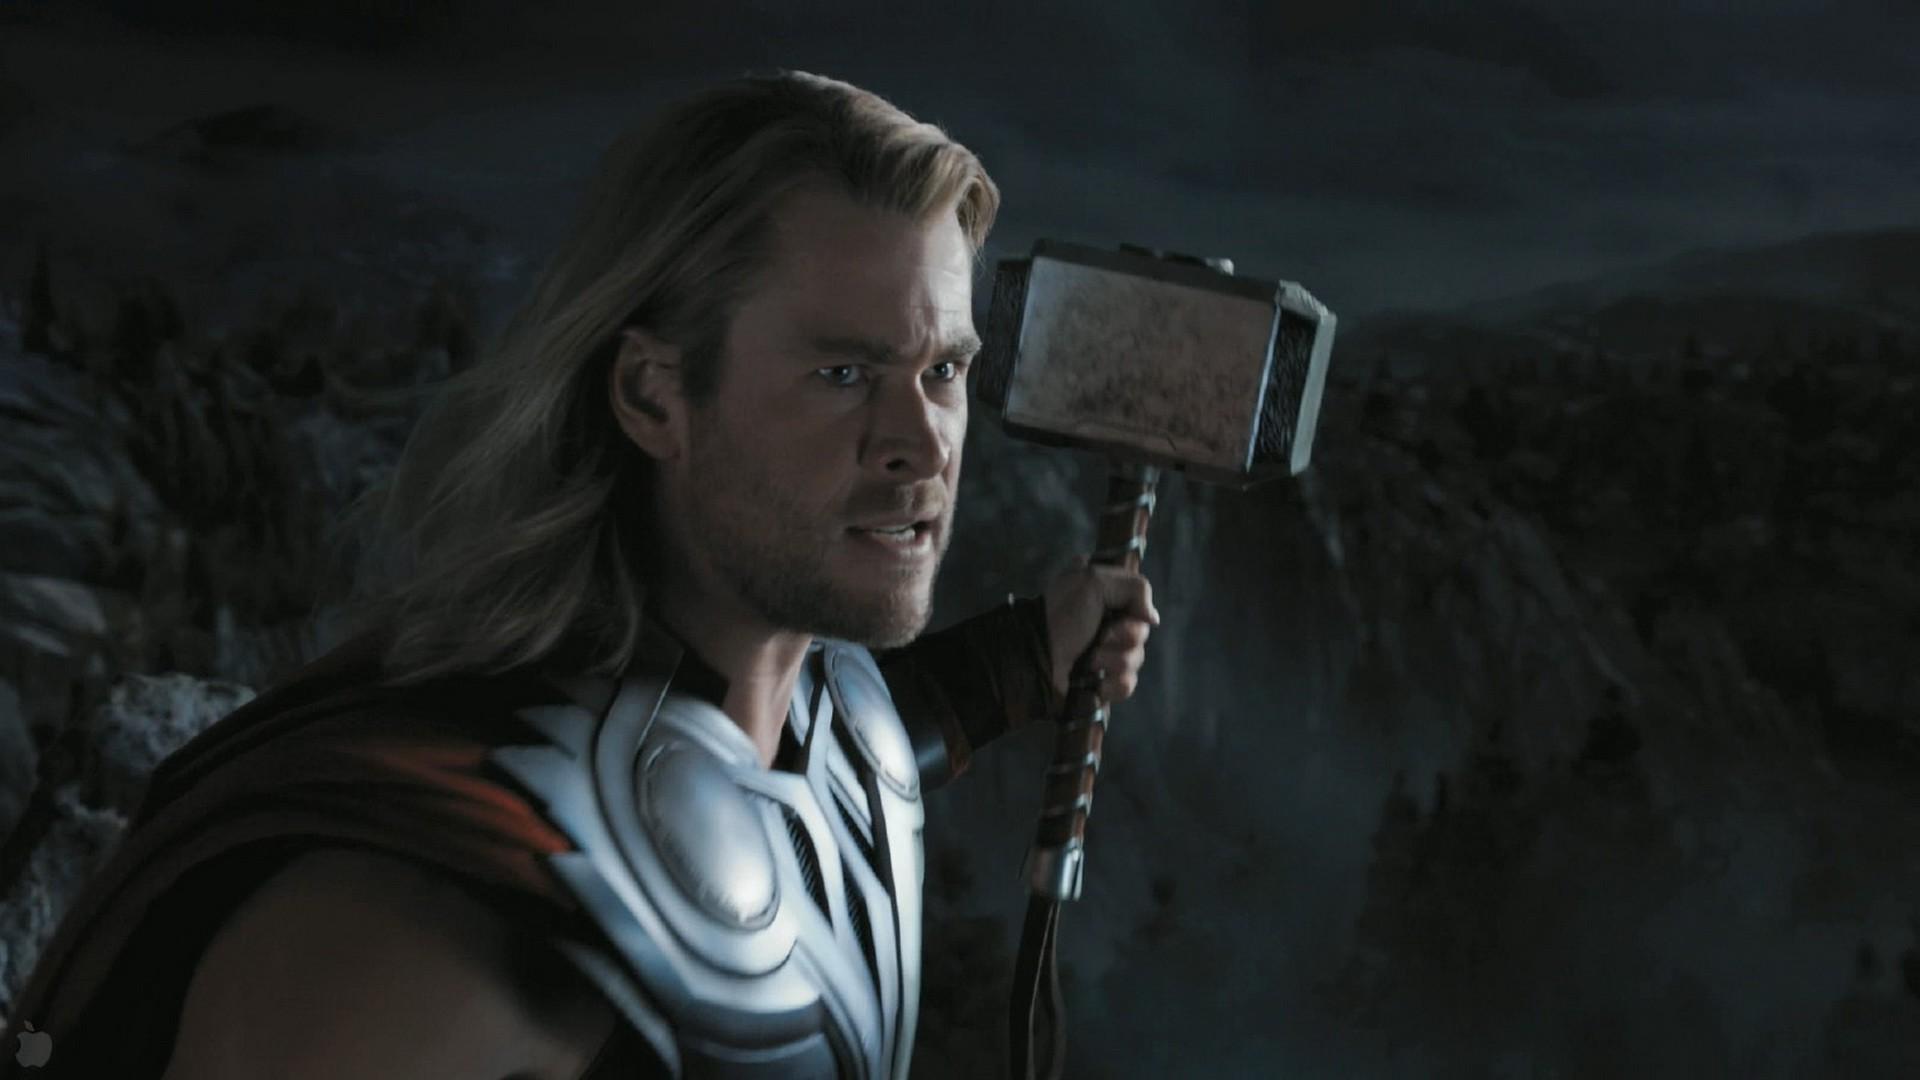 Wallpaper Thor Movies The Avengers Midnight Mjolnir Chris